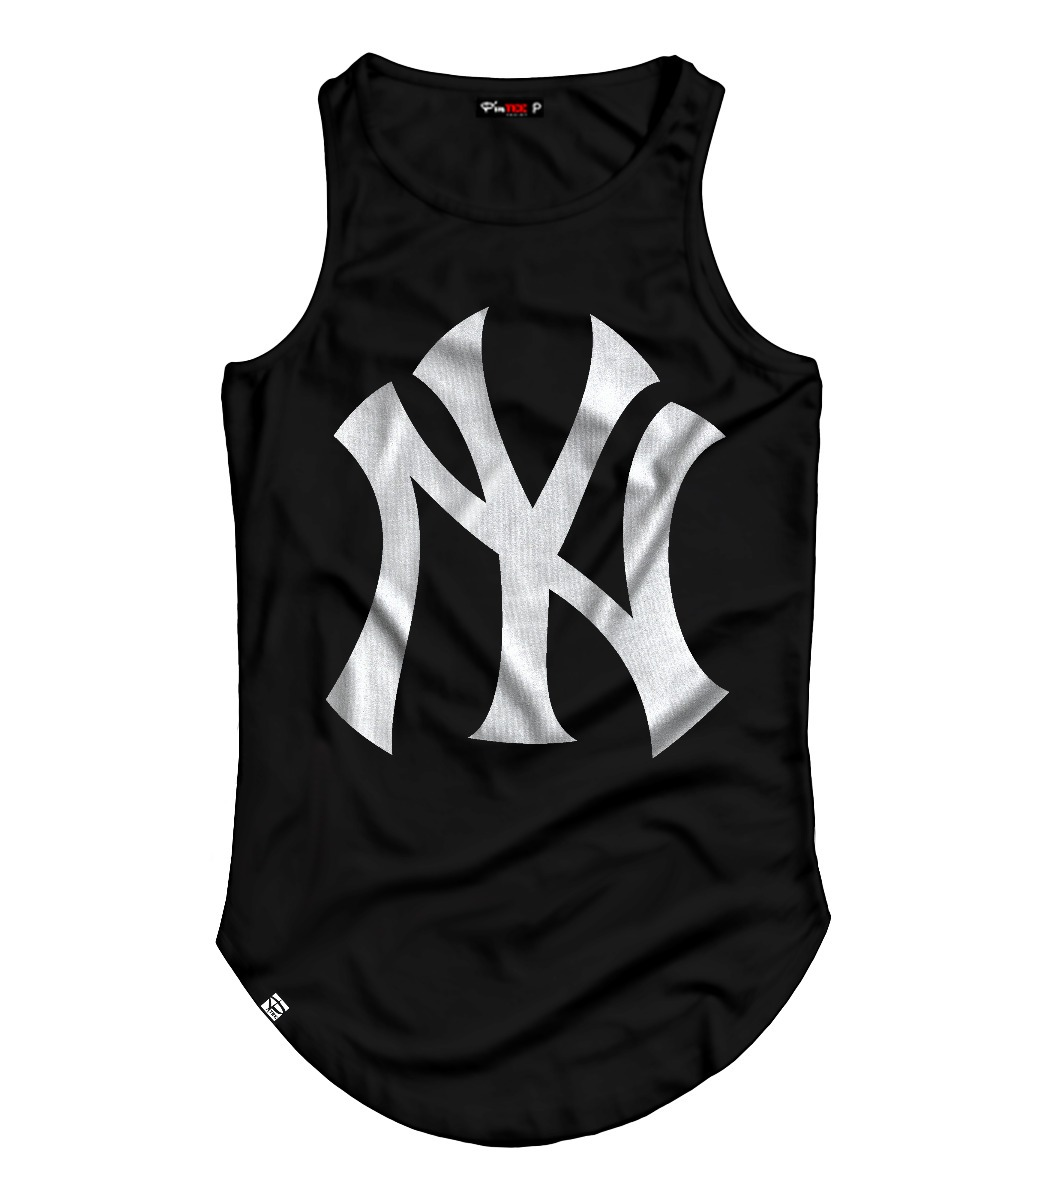 camiseta regata masculina regata long line new york ny. Carregando zoom. c1e6c4a410c